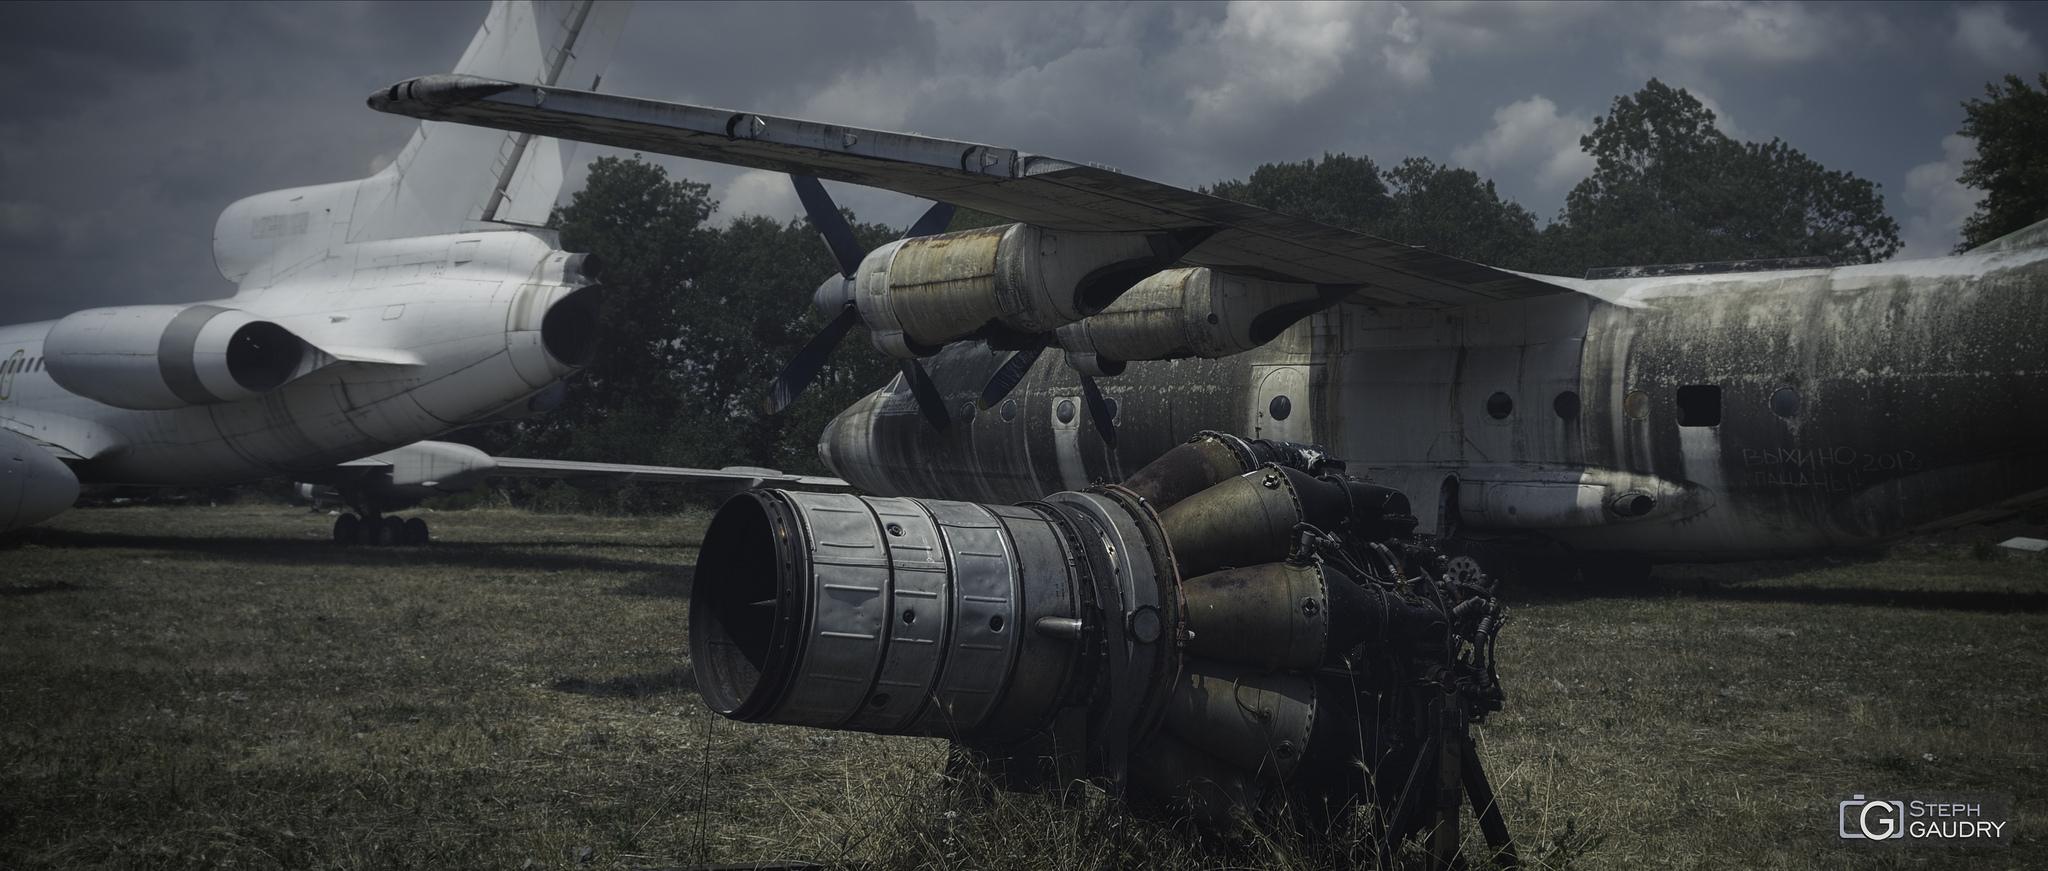 турбовинтовыми двигателями Антонова АИ-24 [Cliquez pour lancer le diaporama]